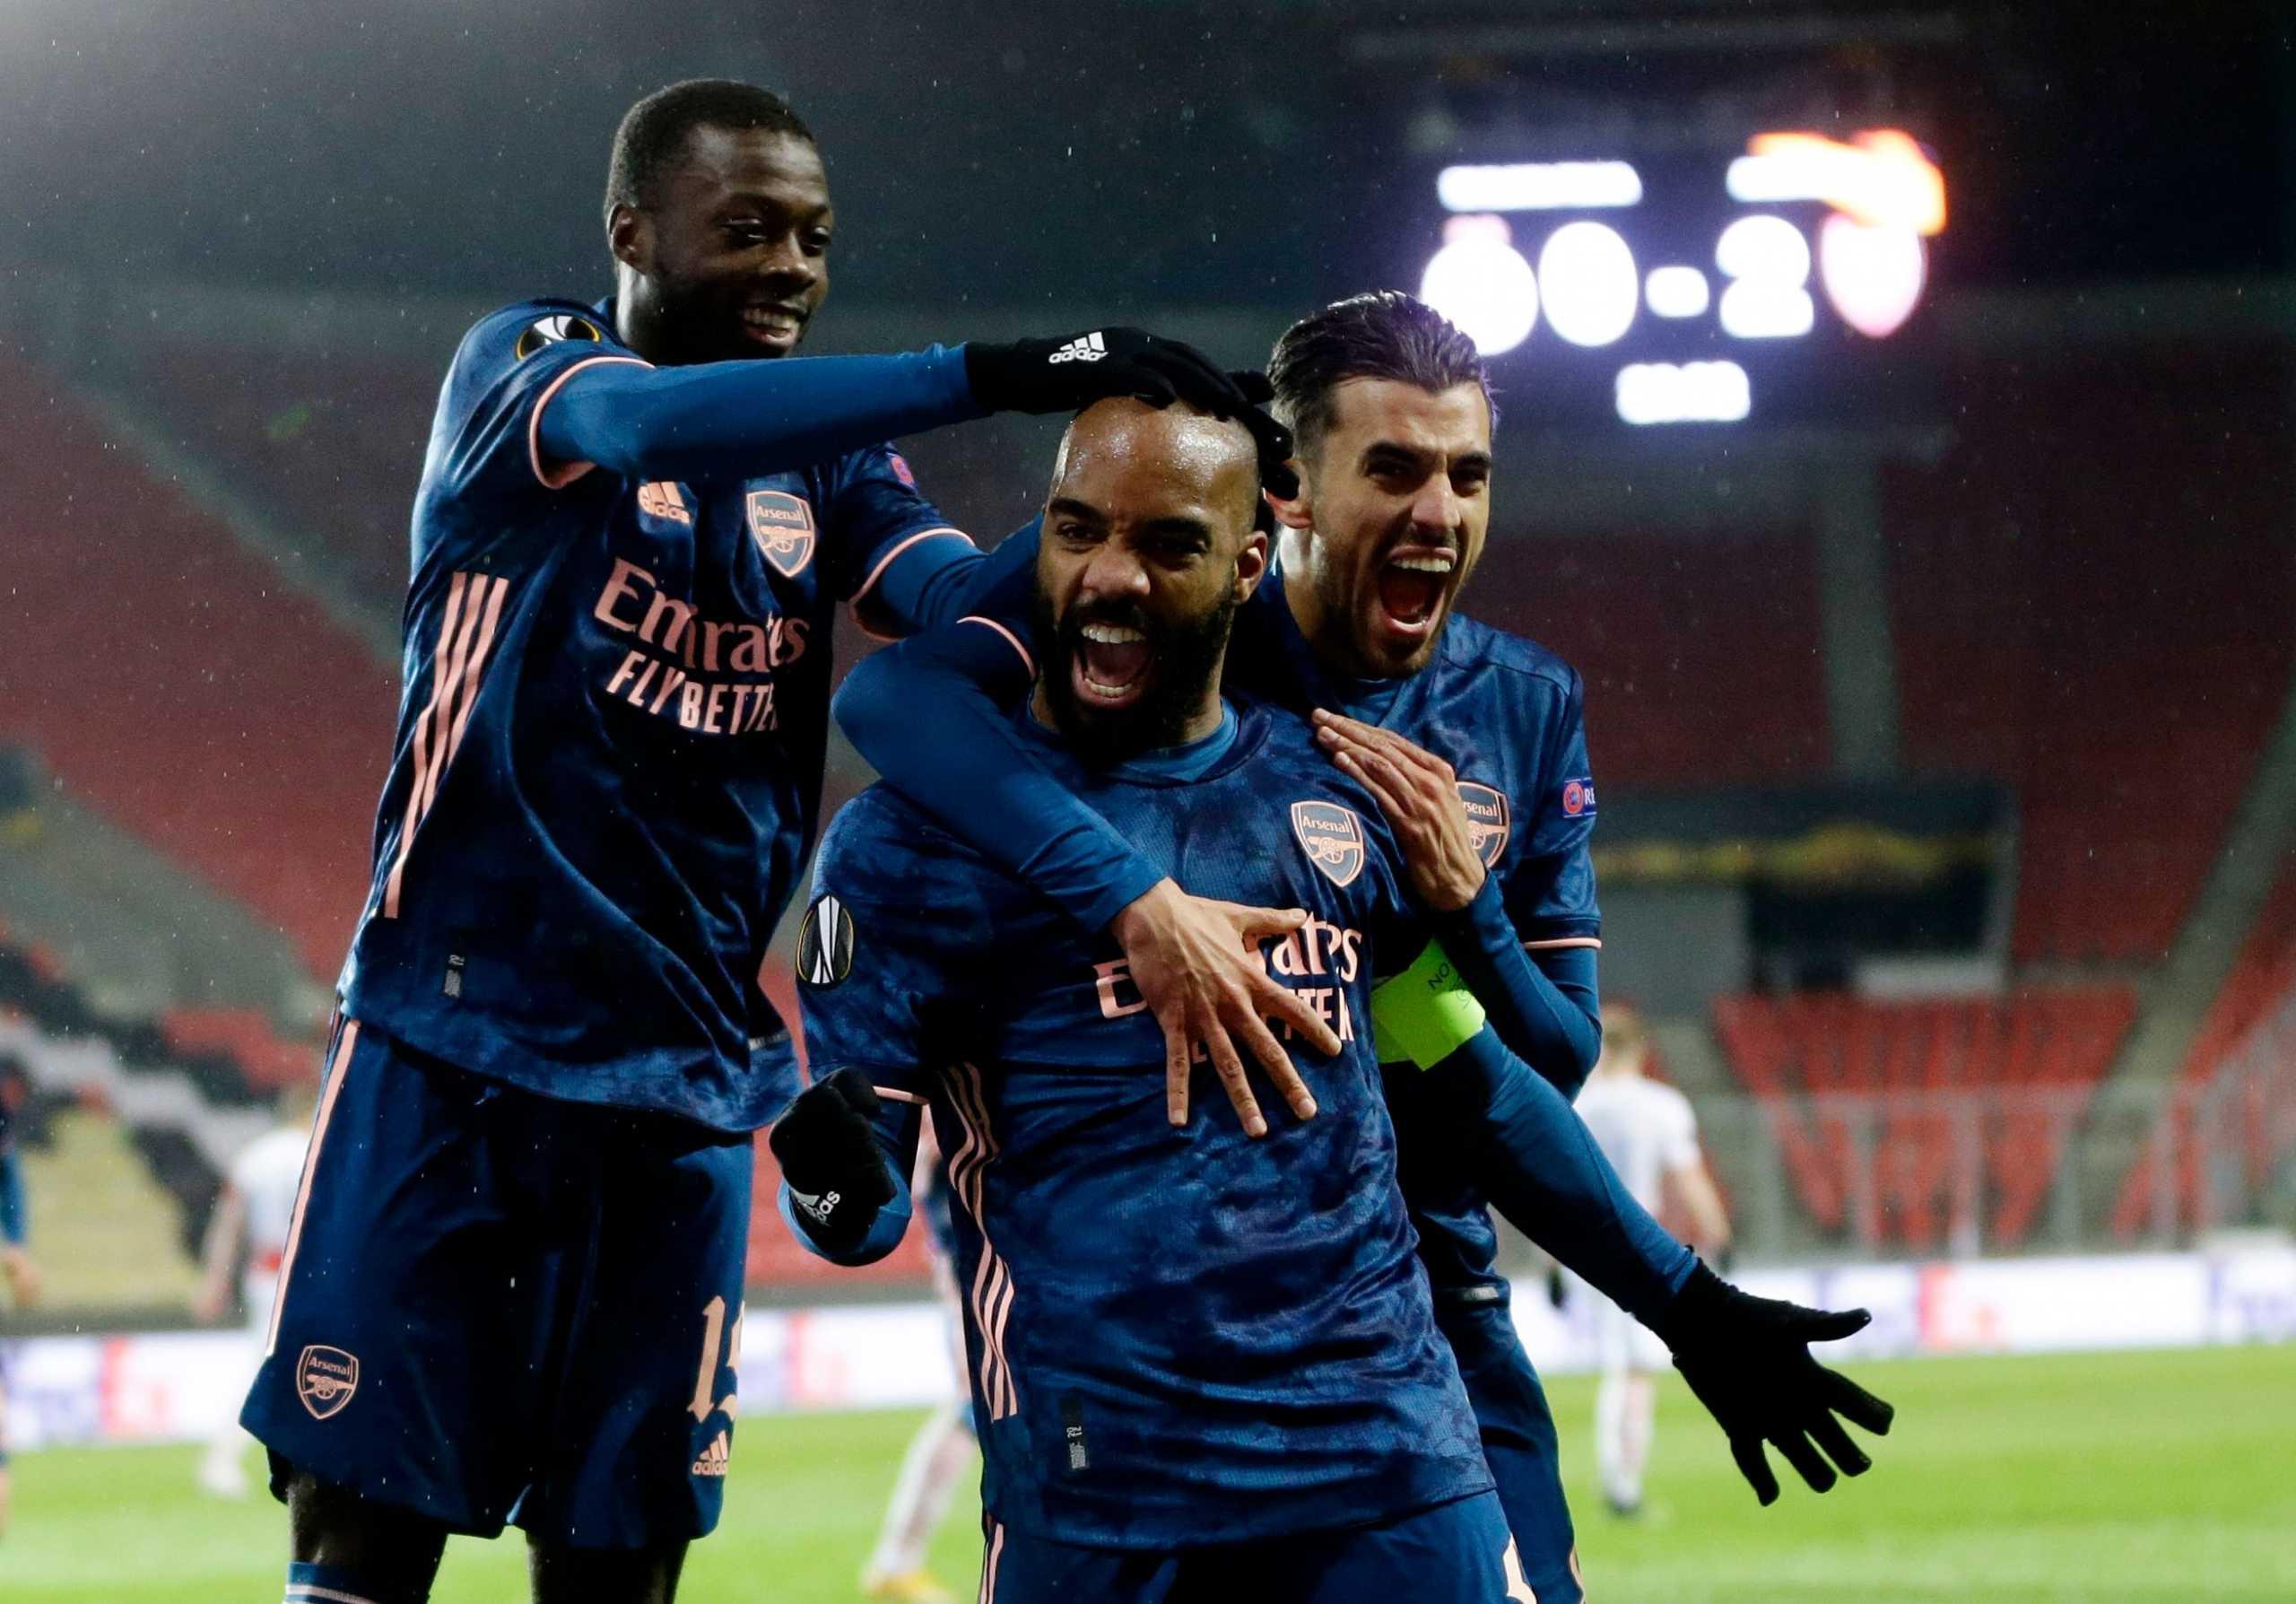 Europa league: Στα ημιτελικά Άρσεναλ, Μάντσεστερ Γιουνάιτεντ, Ρόμα και Βιγιαρεάλ (videos)